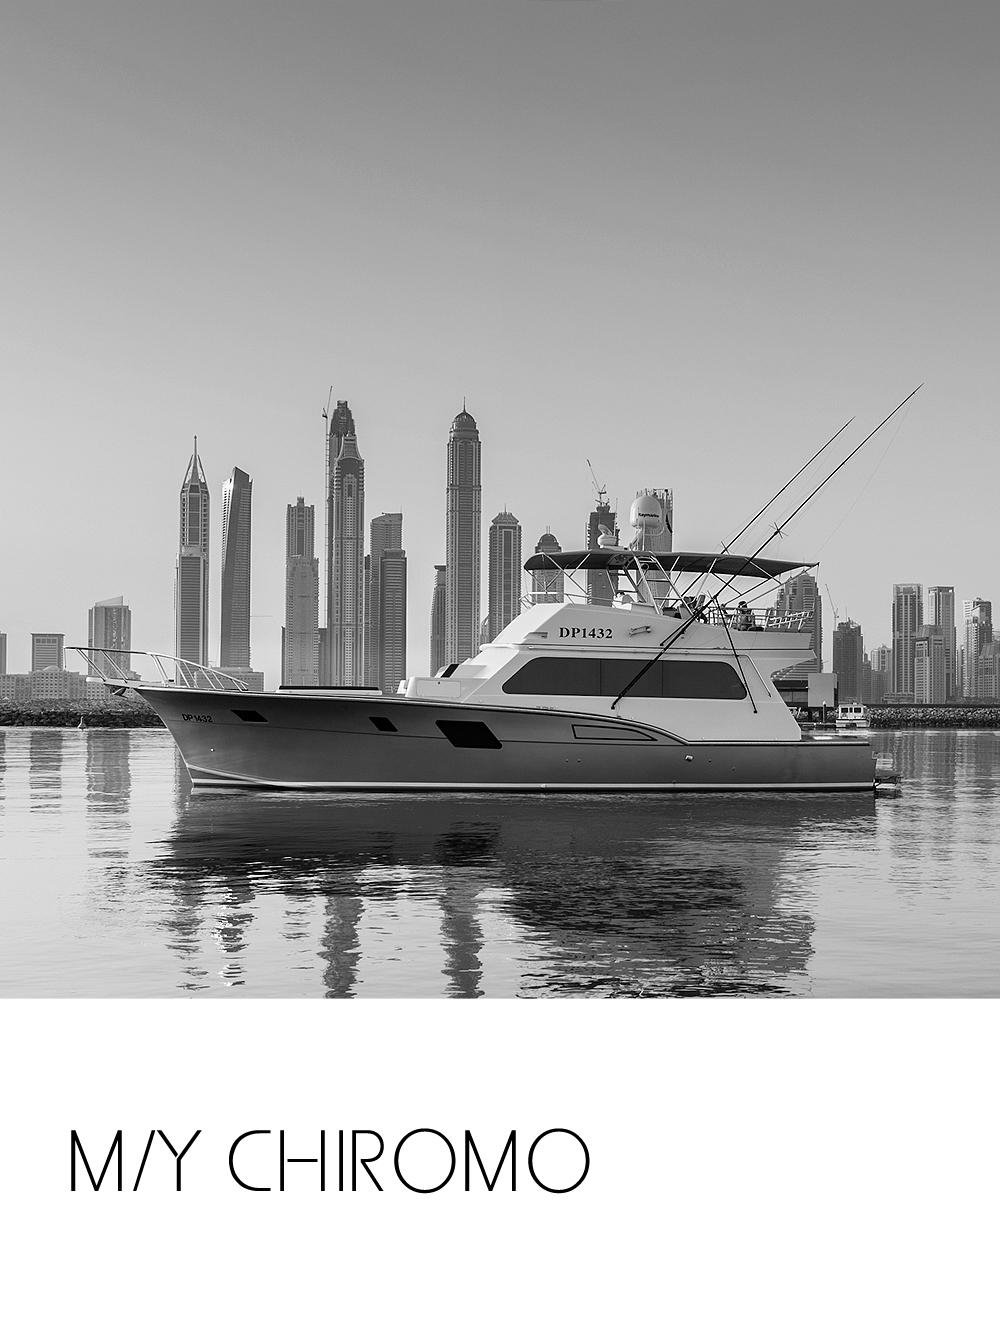 M/Y Chiromo